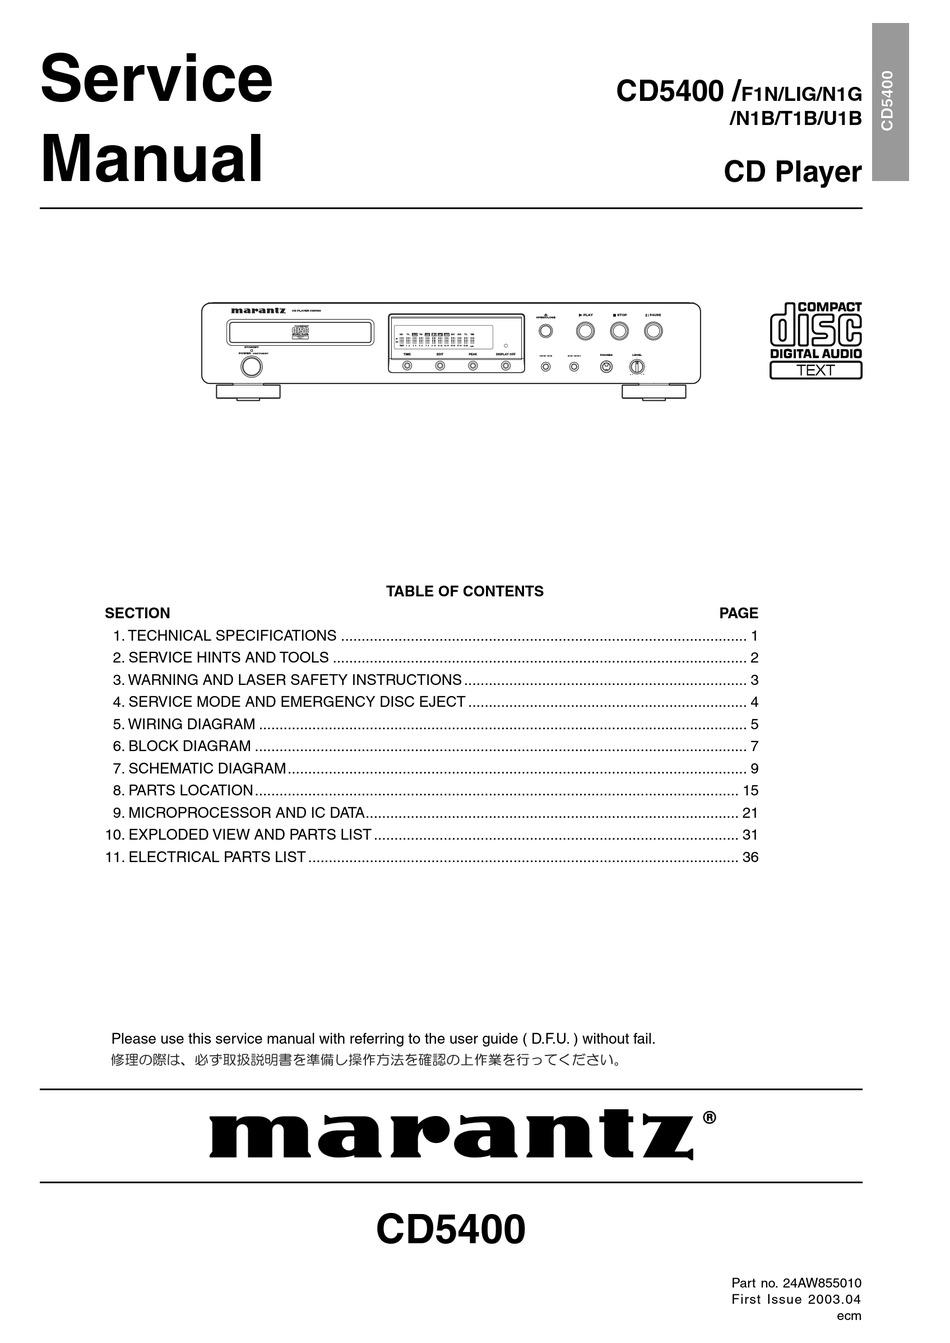 Marantz Cd5400 Service Manual Pdf Download Manualslib